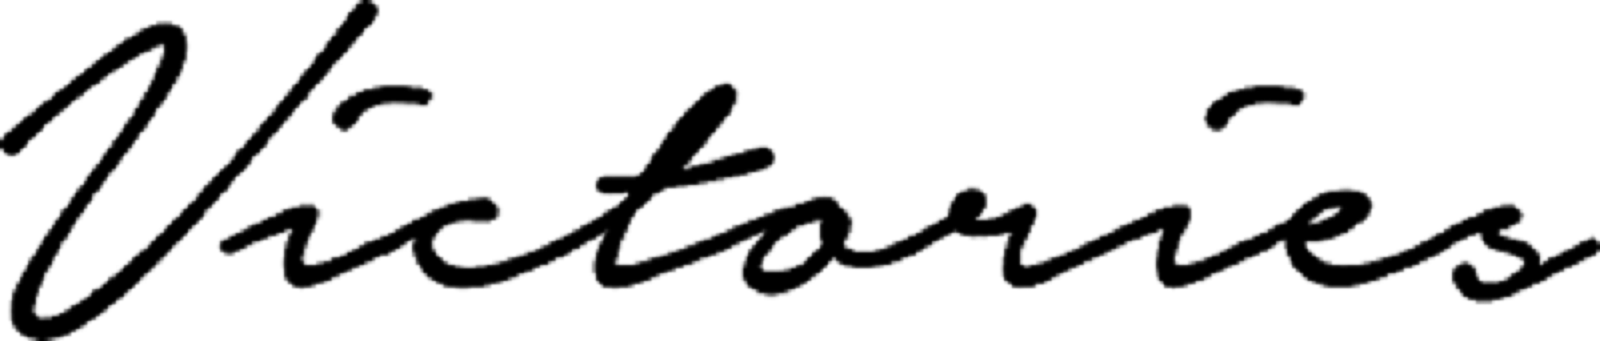 Victories logo noir